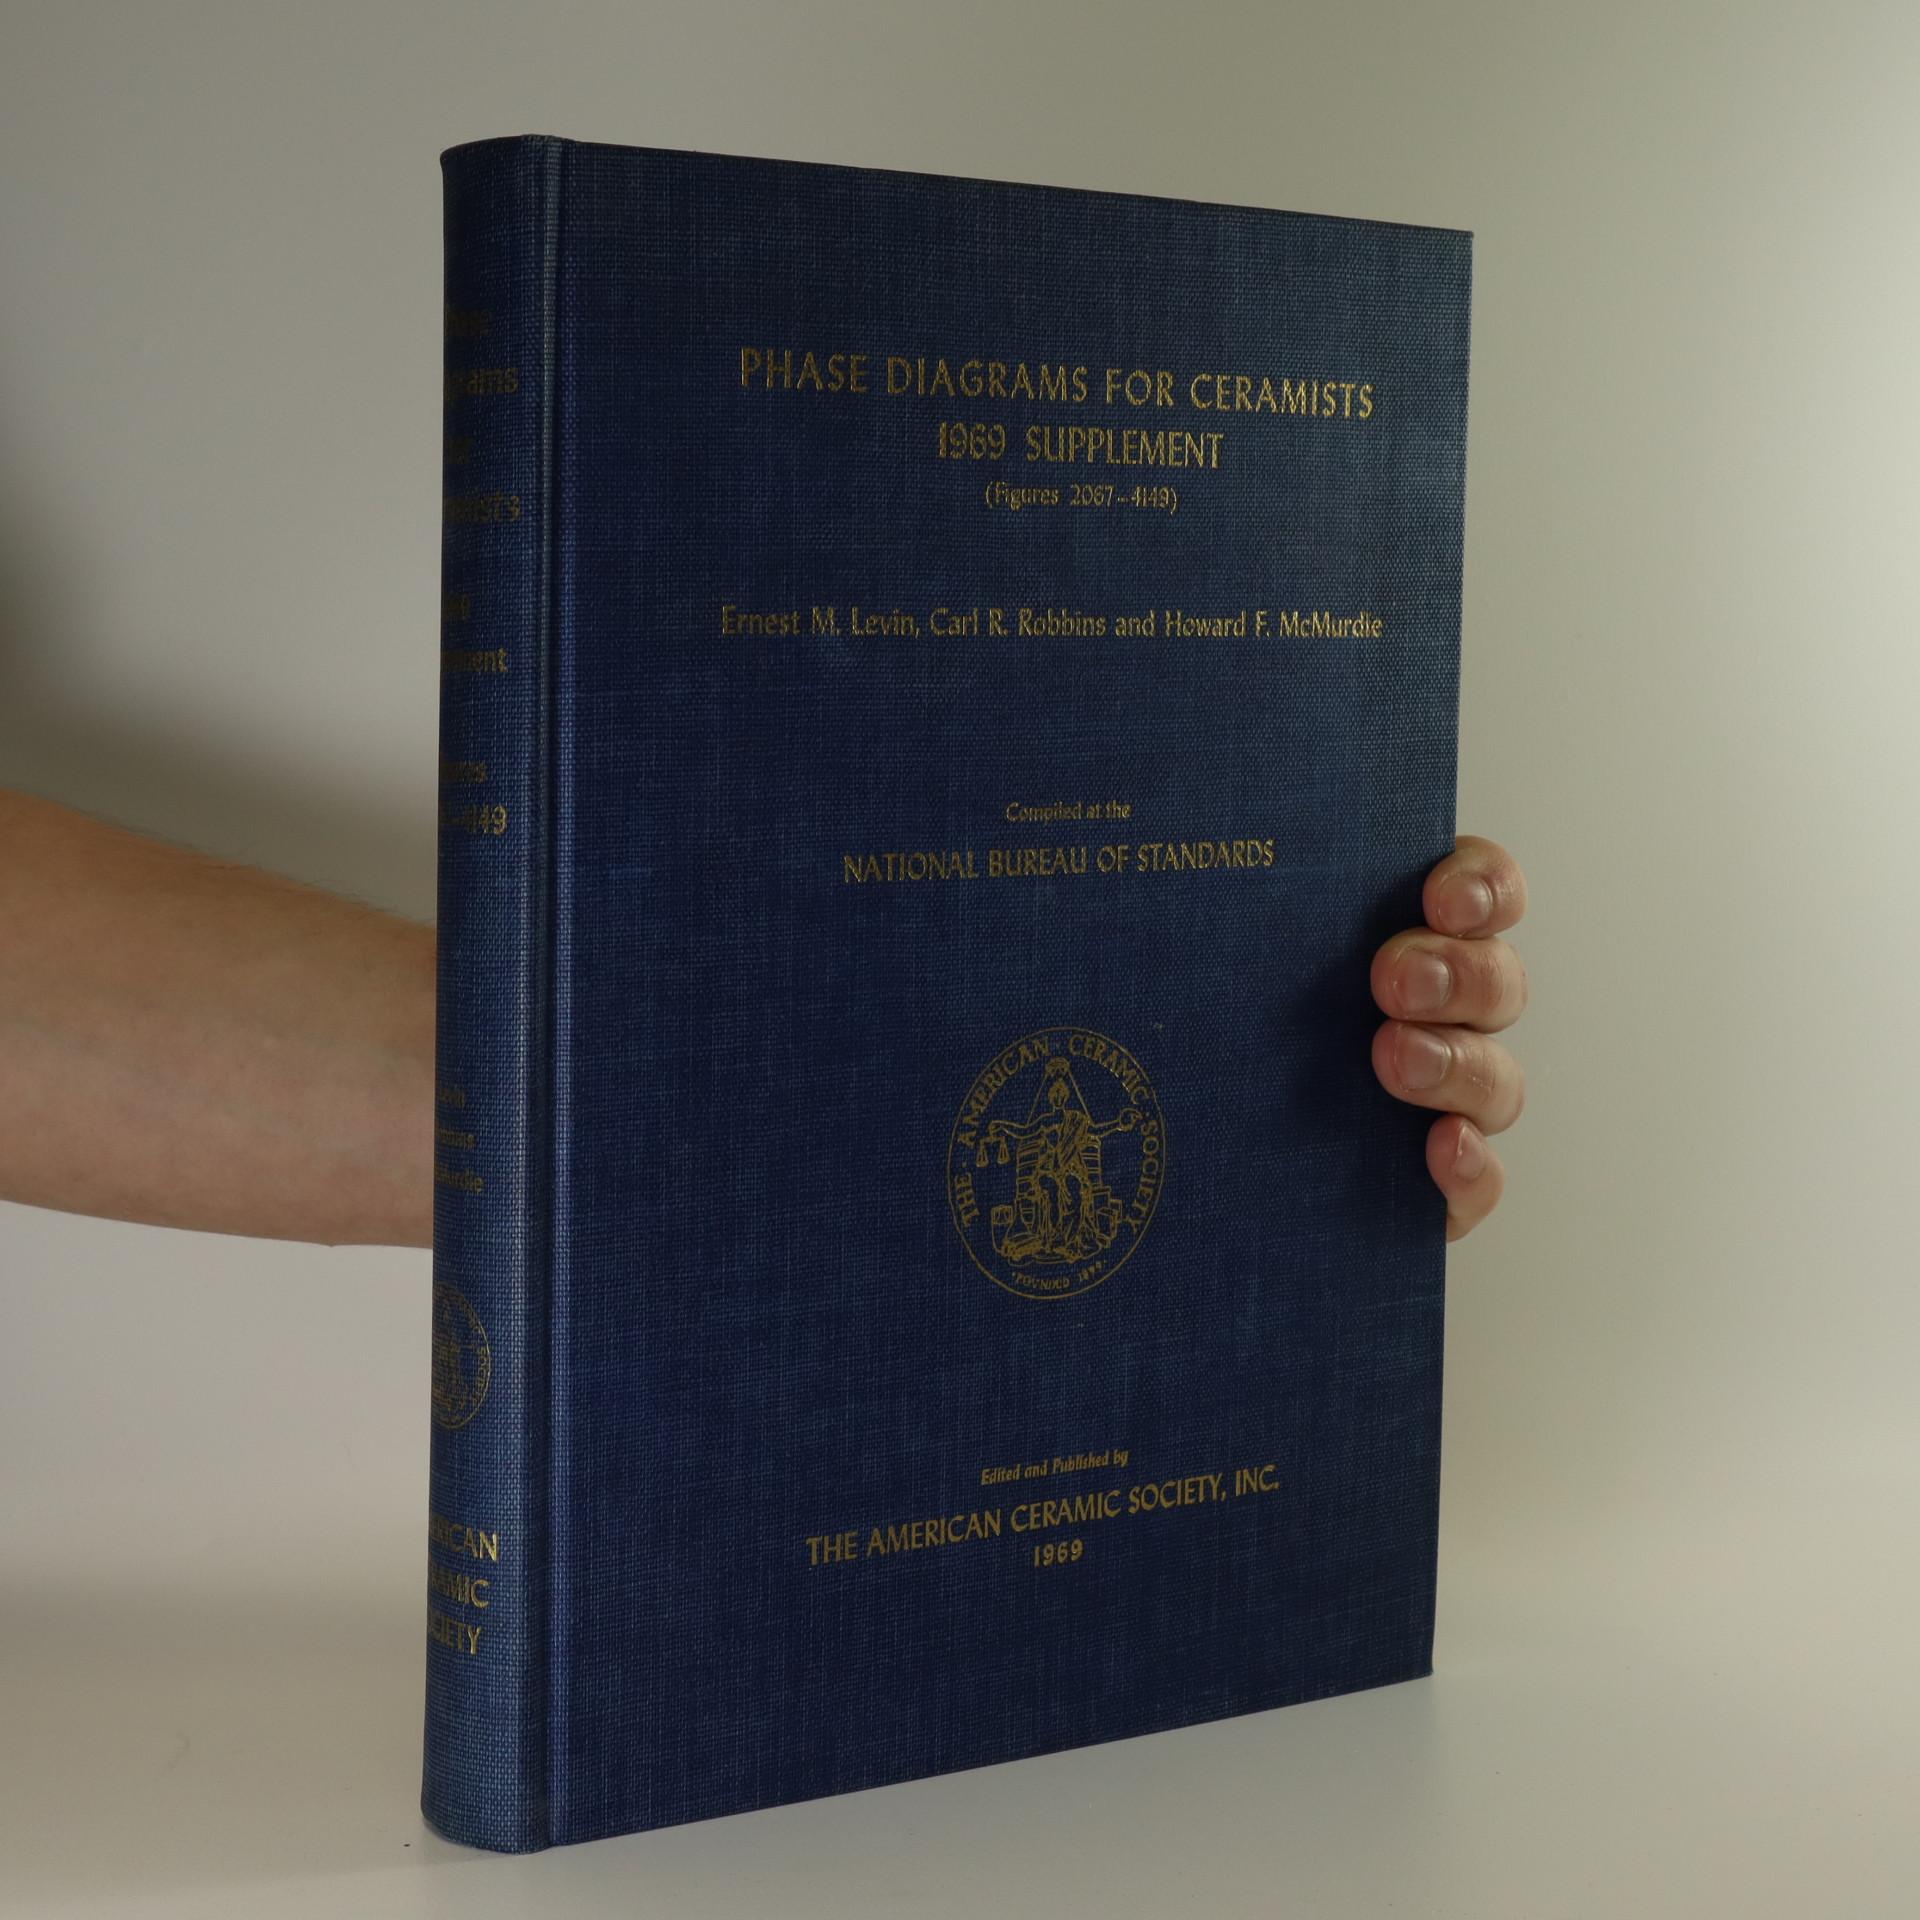 antikvární kniha Phase Diagrams for Ceramists 1969 Supplement, 1969